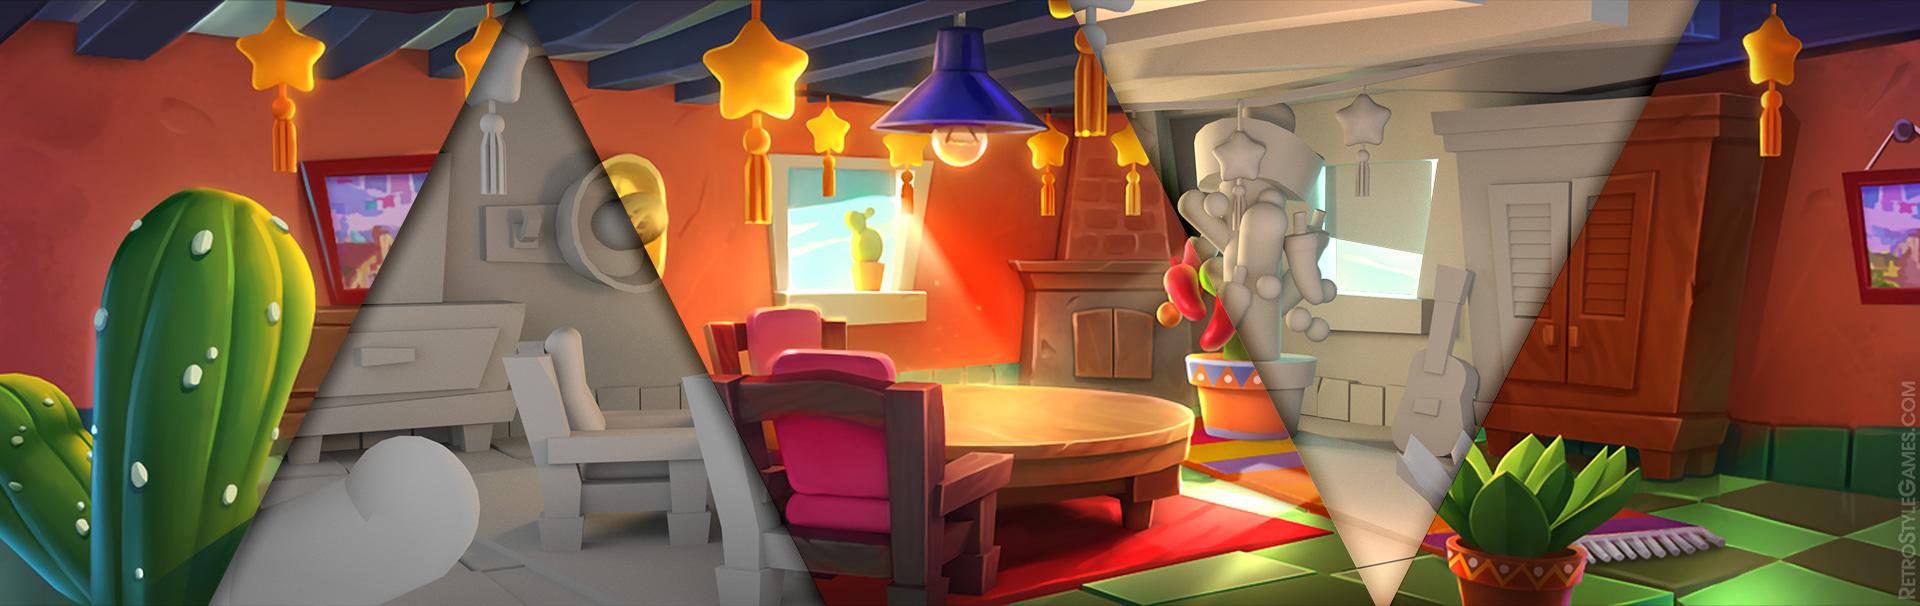 Blending 2D 3D Modeling Background Homepage Interior